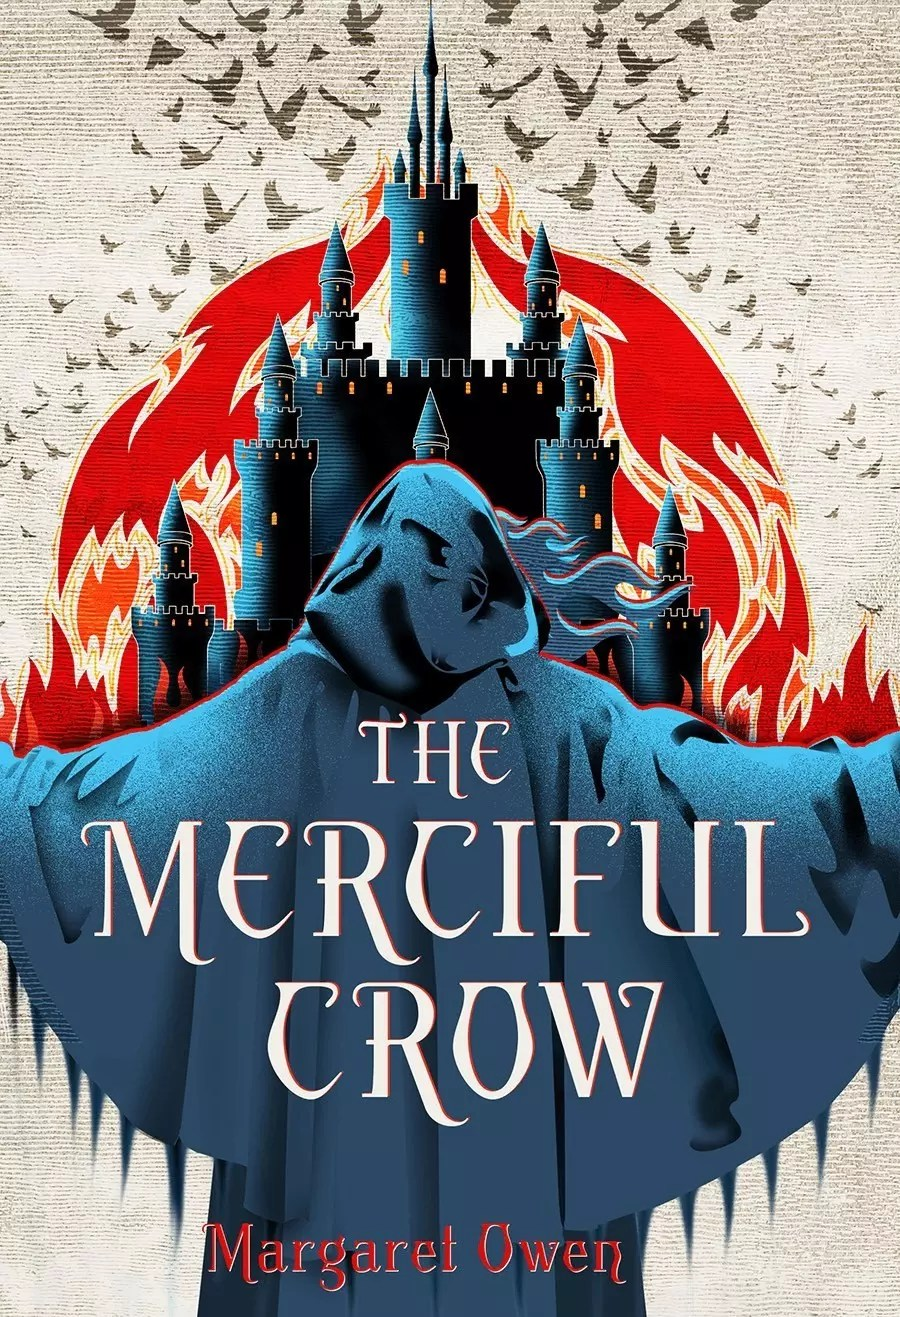 margaret owen merciful crow